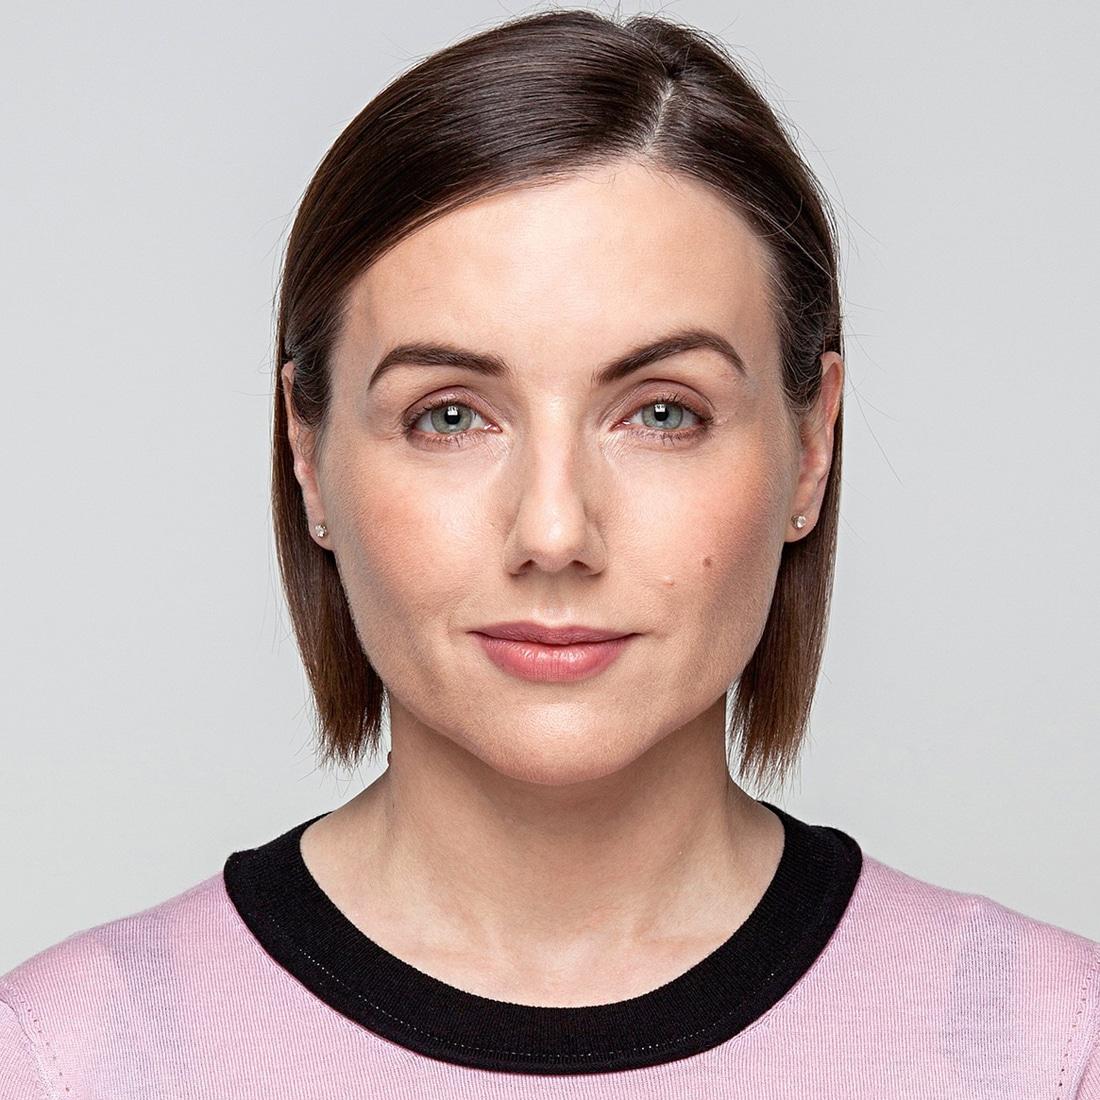 Sali-Hughes-beauty-expert-at-Great-British-Speakers